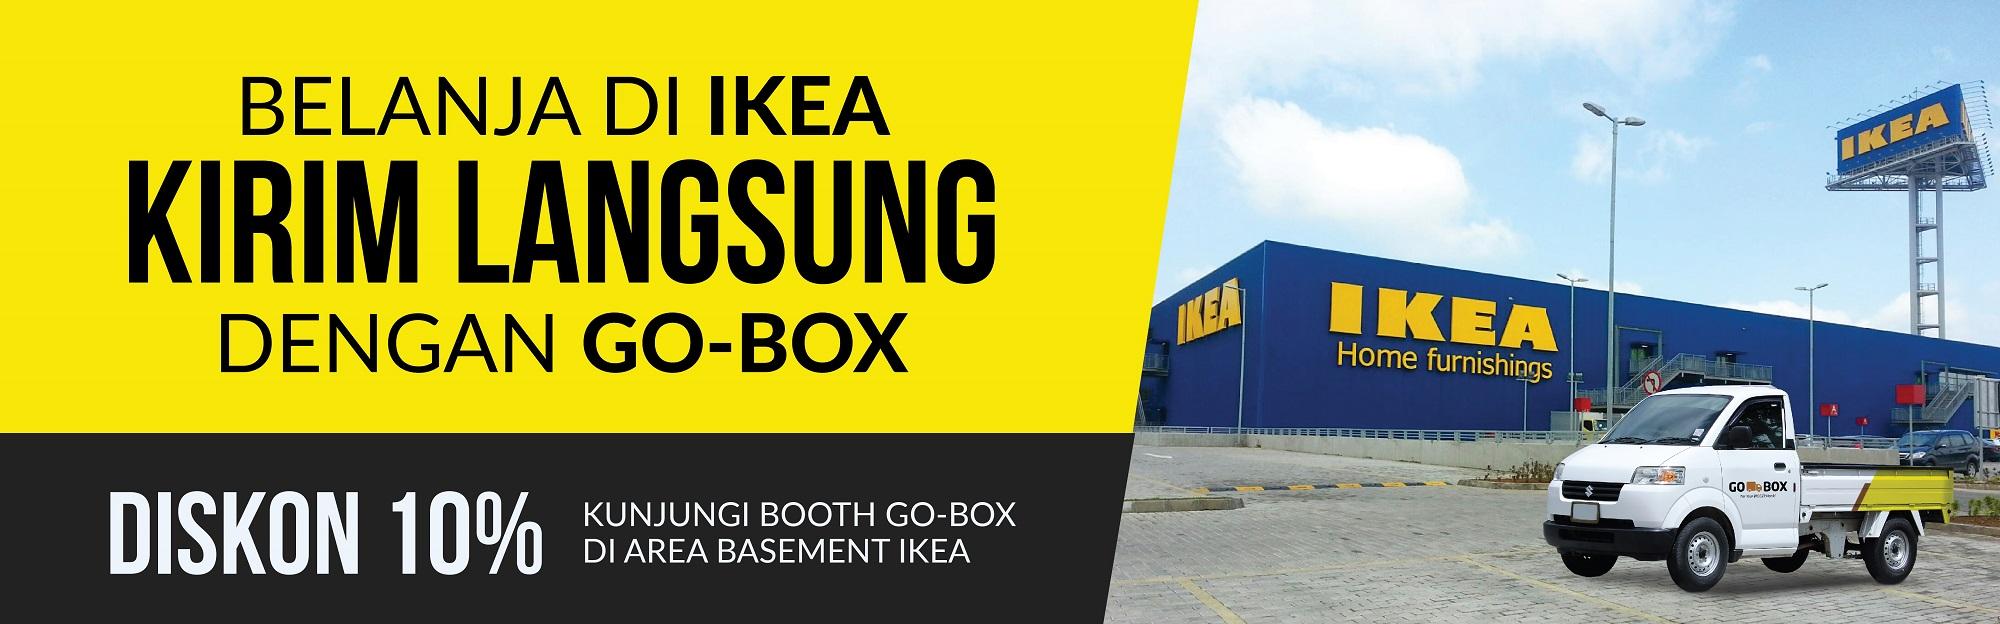 Belanja di Ikea lebih mudah menggunakan GO-BOX